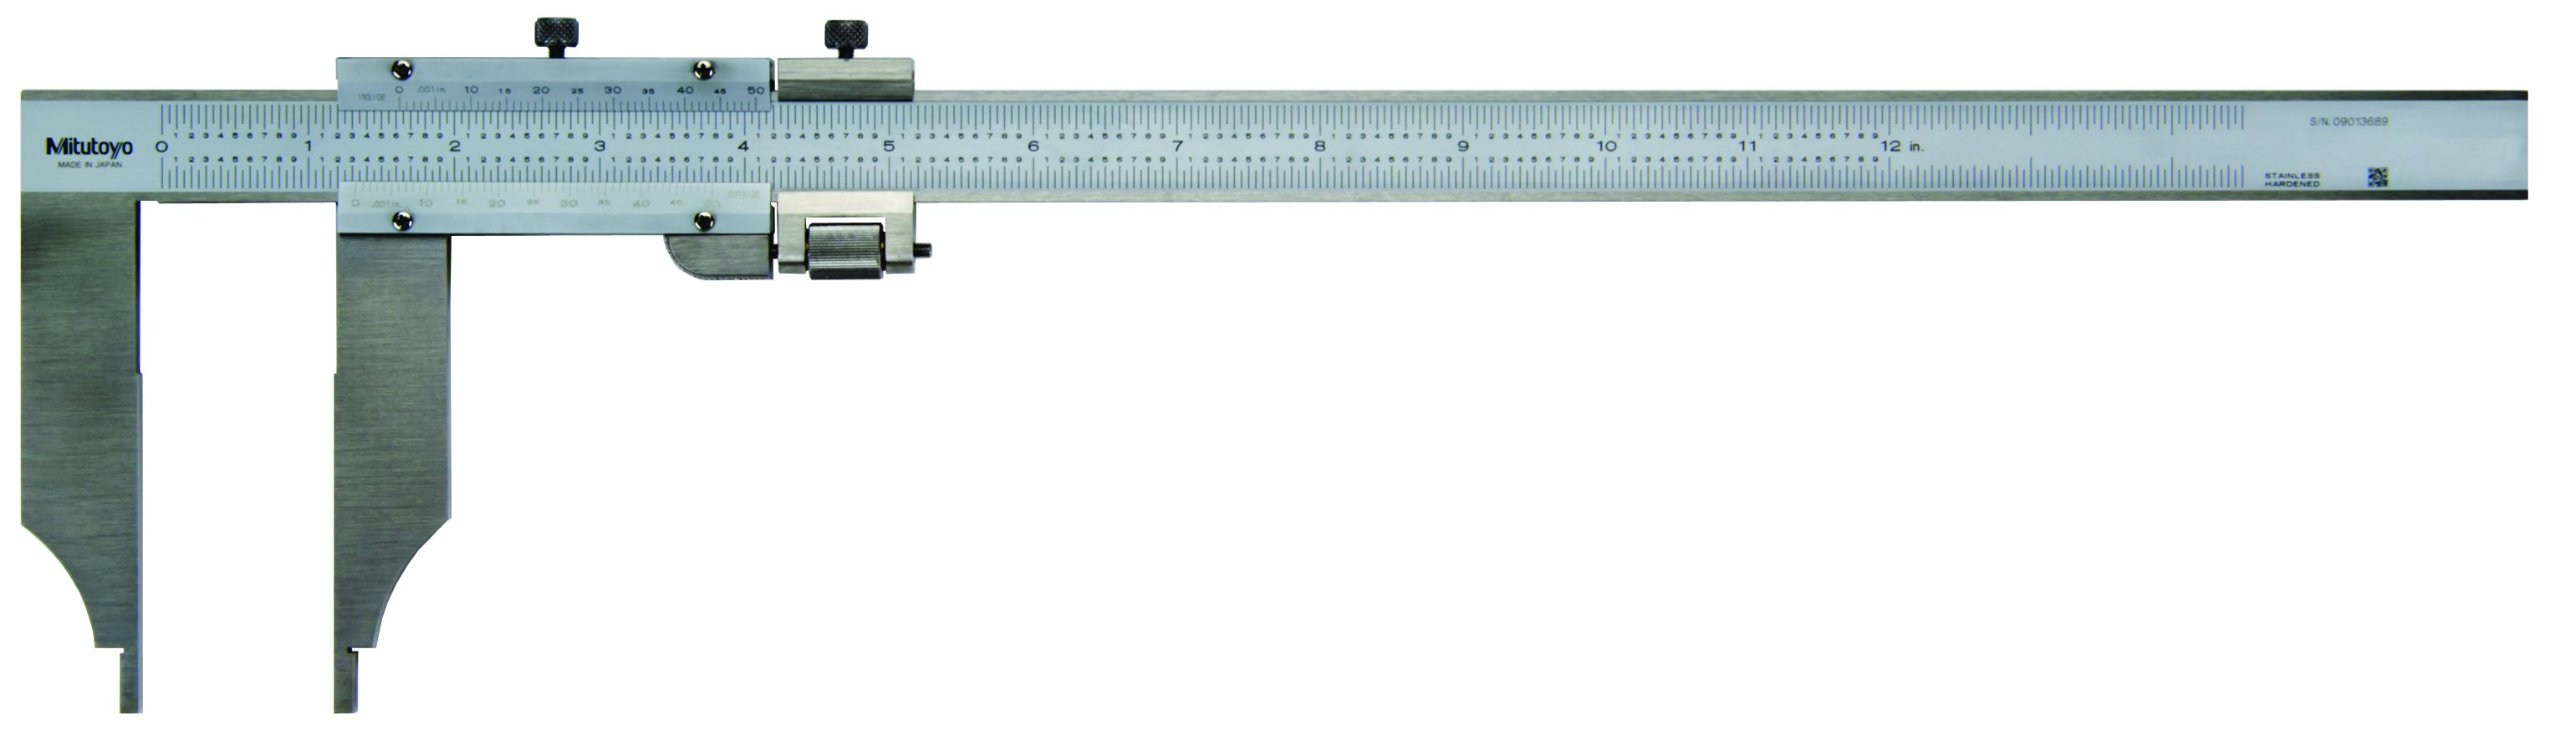 Mitutoyo 534-117 Vernier Caliper, Steel, Nib Style, Long Jaw, 0-12'' Range, +/-0.002'' Accuracy, 0.001'' Resolution